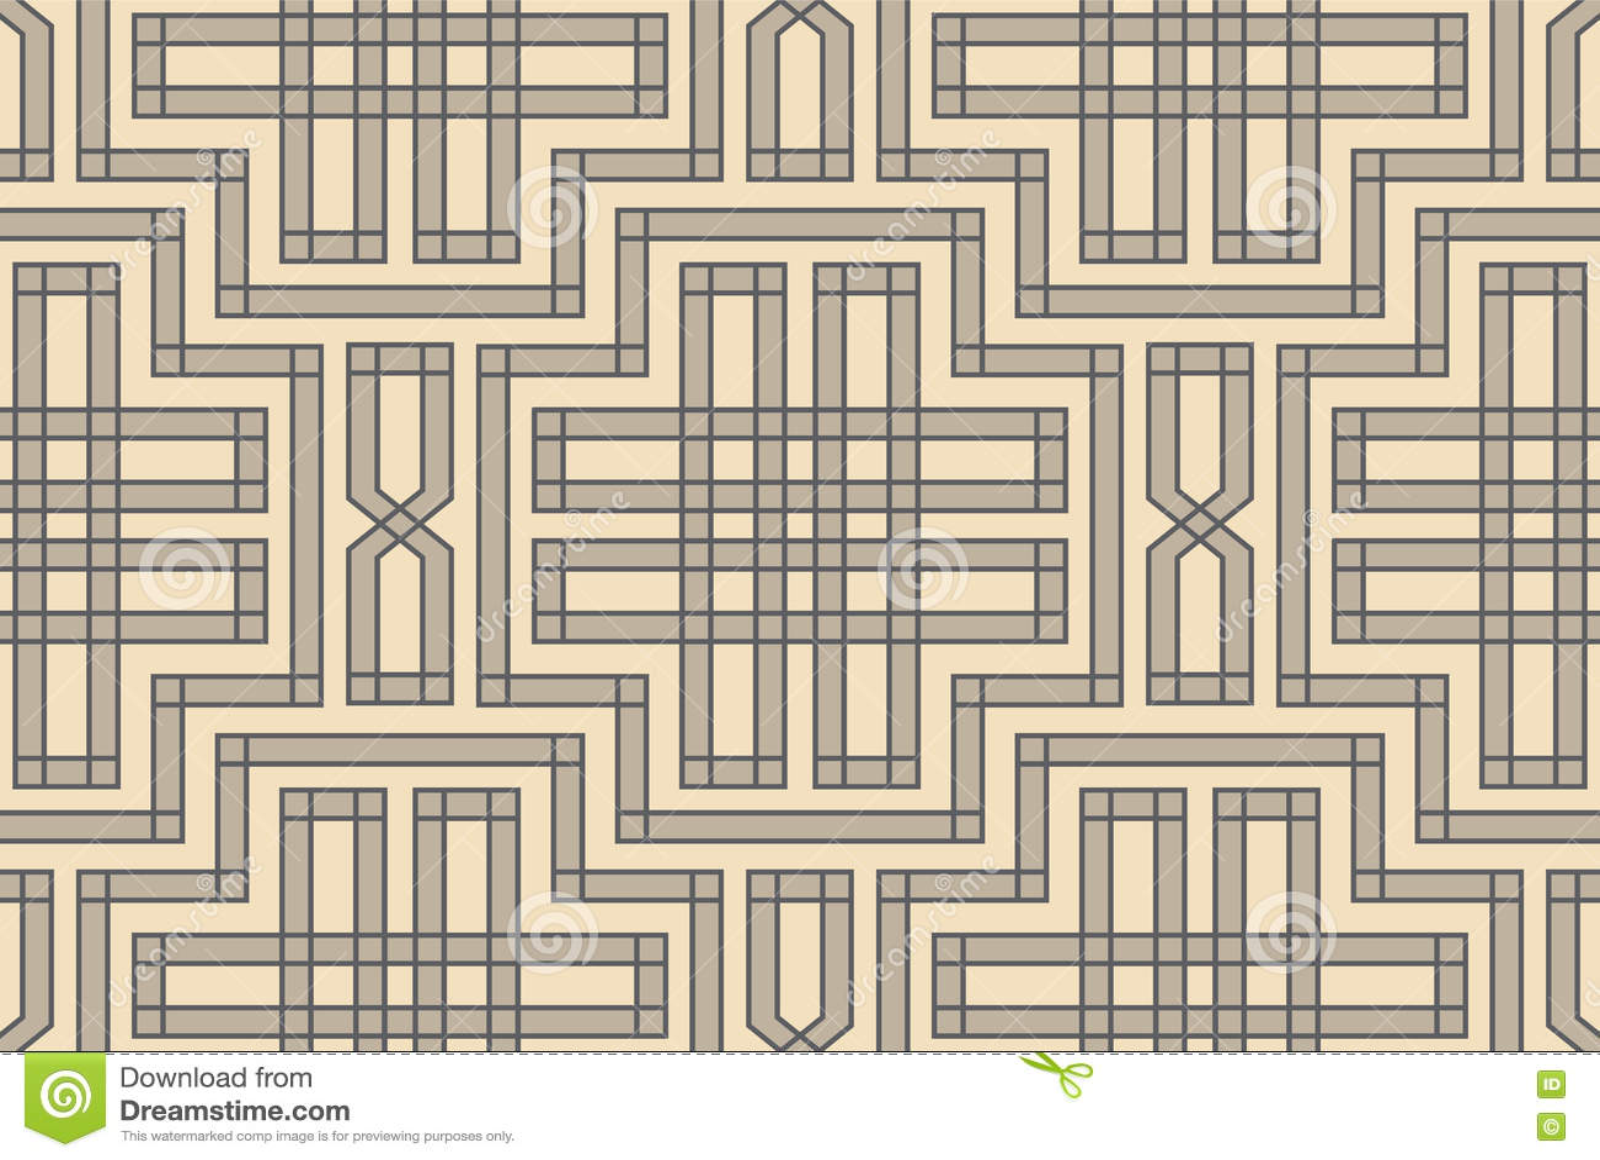 Retro repetitive wallpaper - Vintage vector pattern